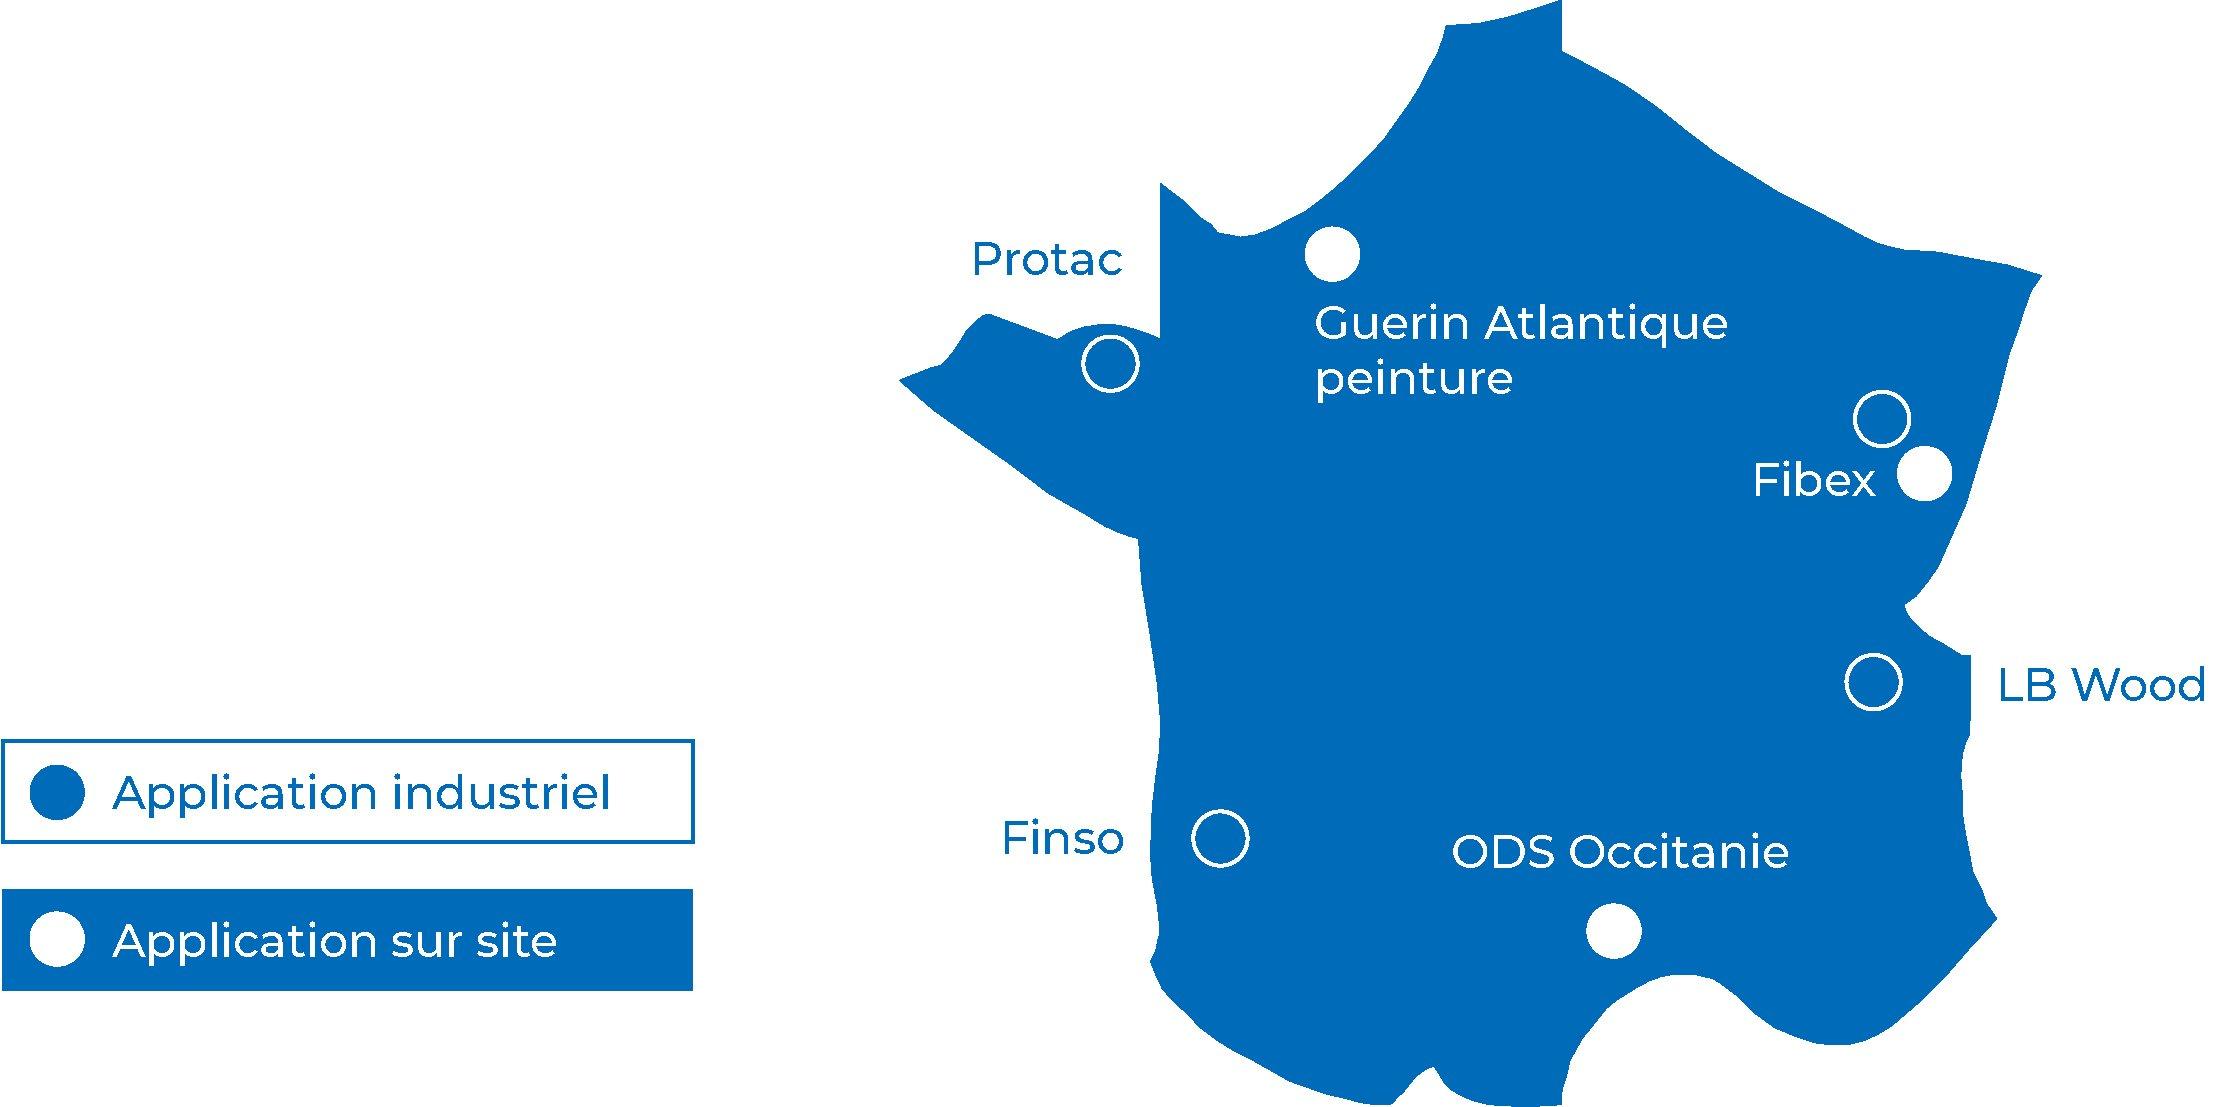 france_patner_map